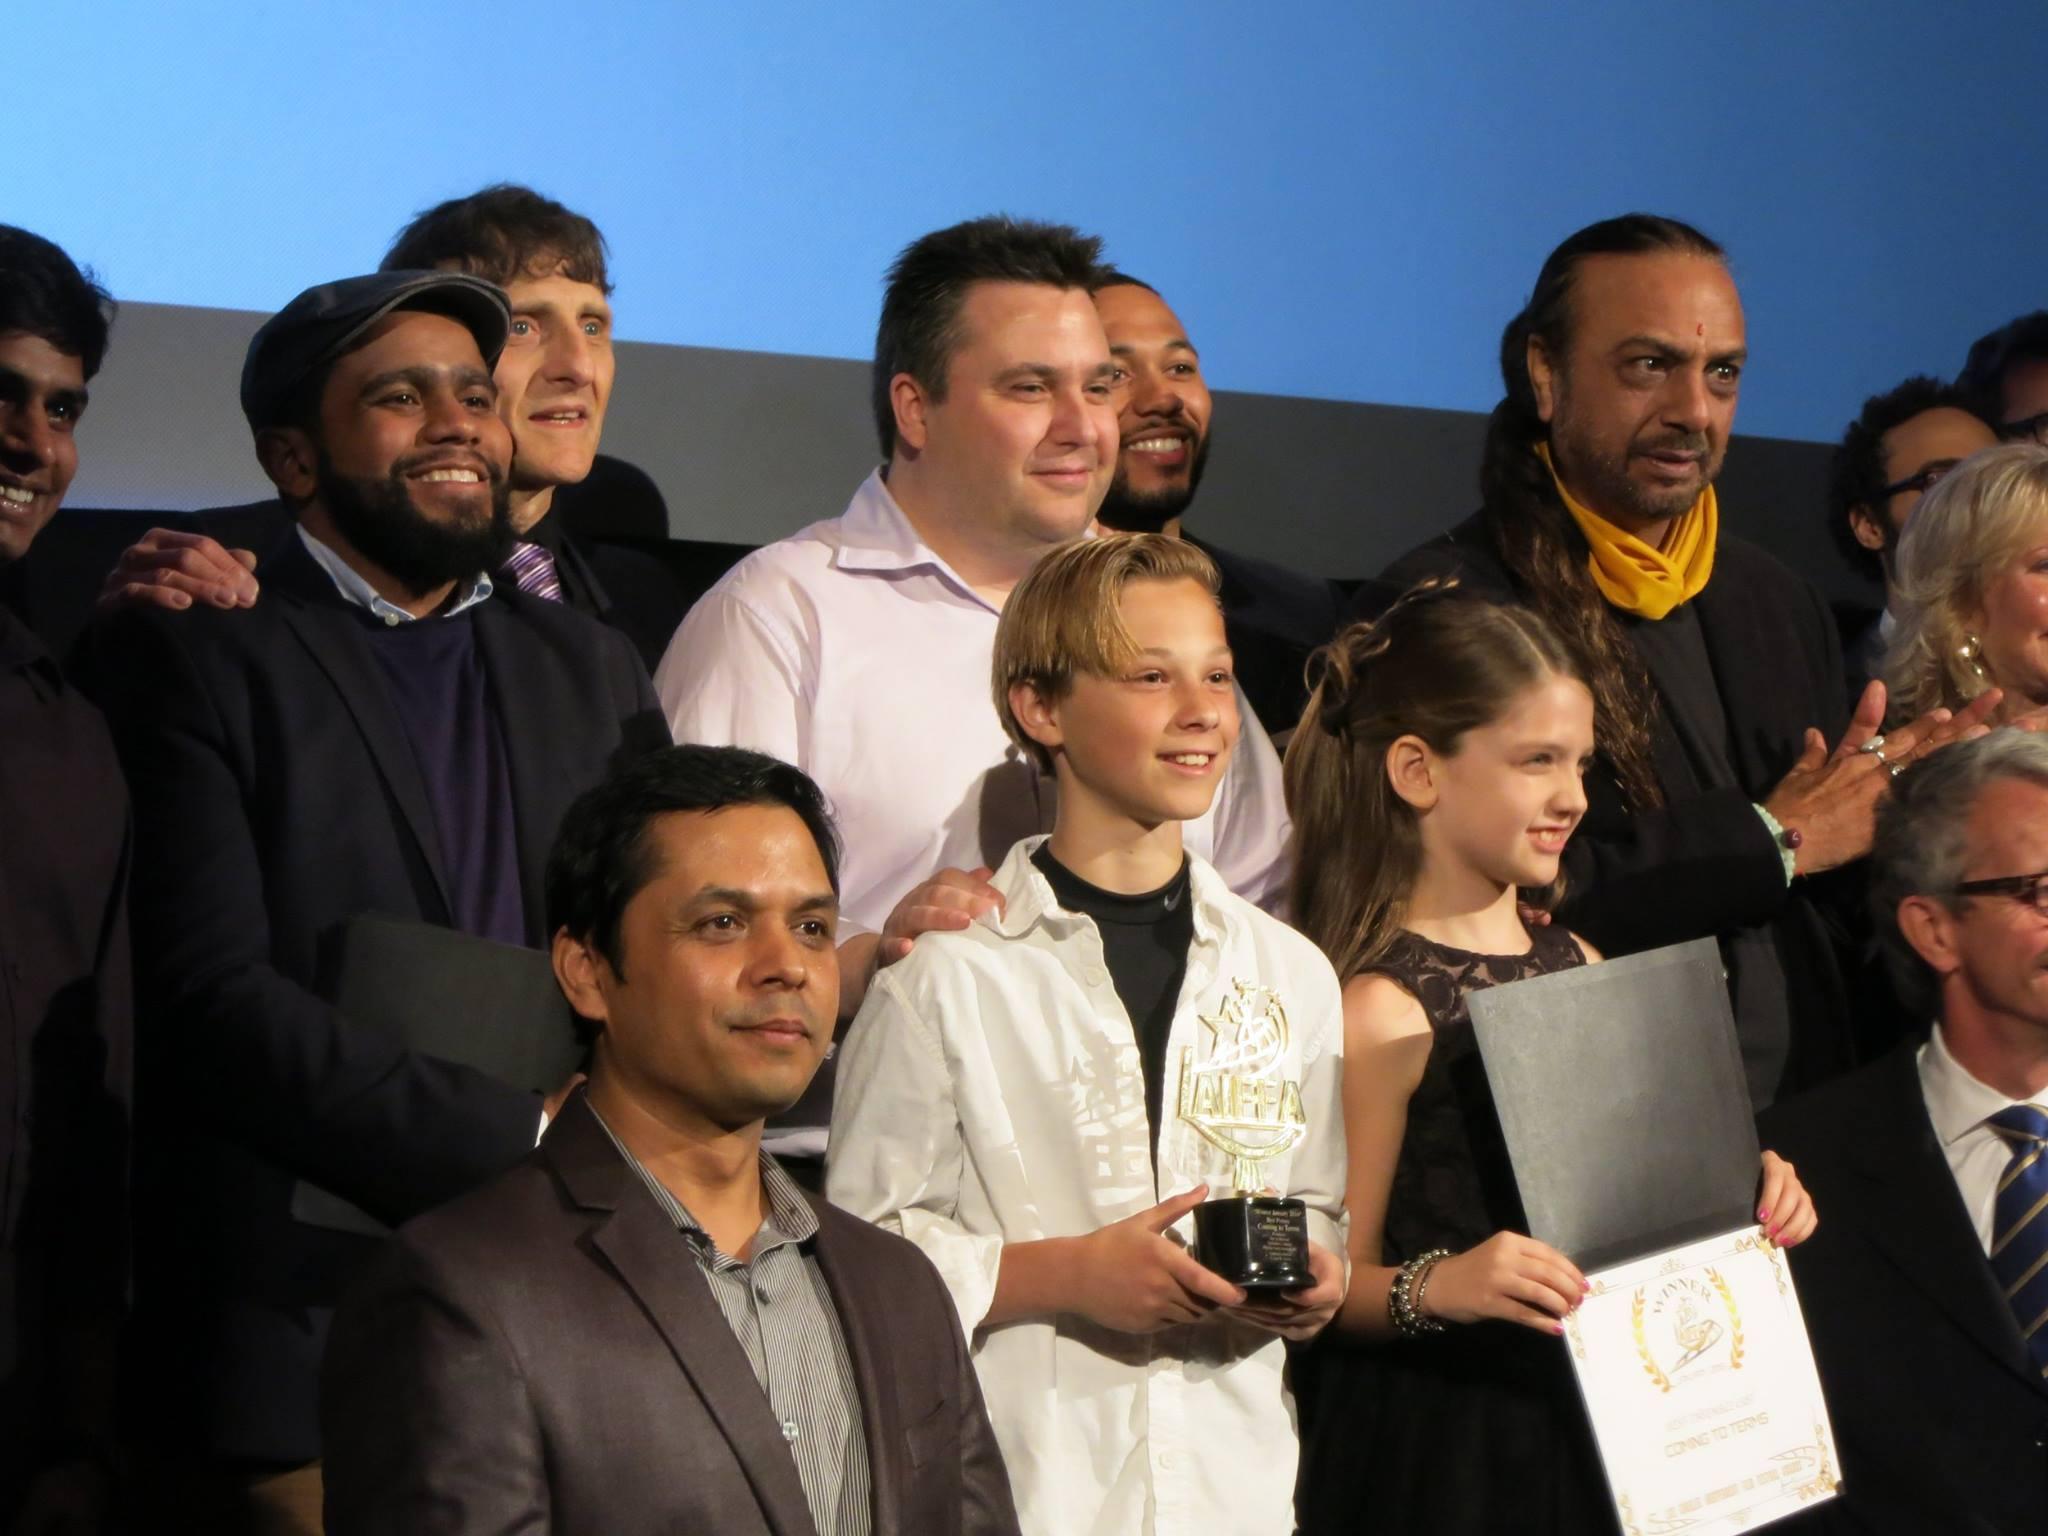 Best Short Film | Best Ensemble Cast | Best Cinematography at Los Angeles Independent Film Festival Awards (2015)